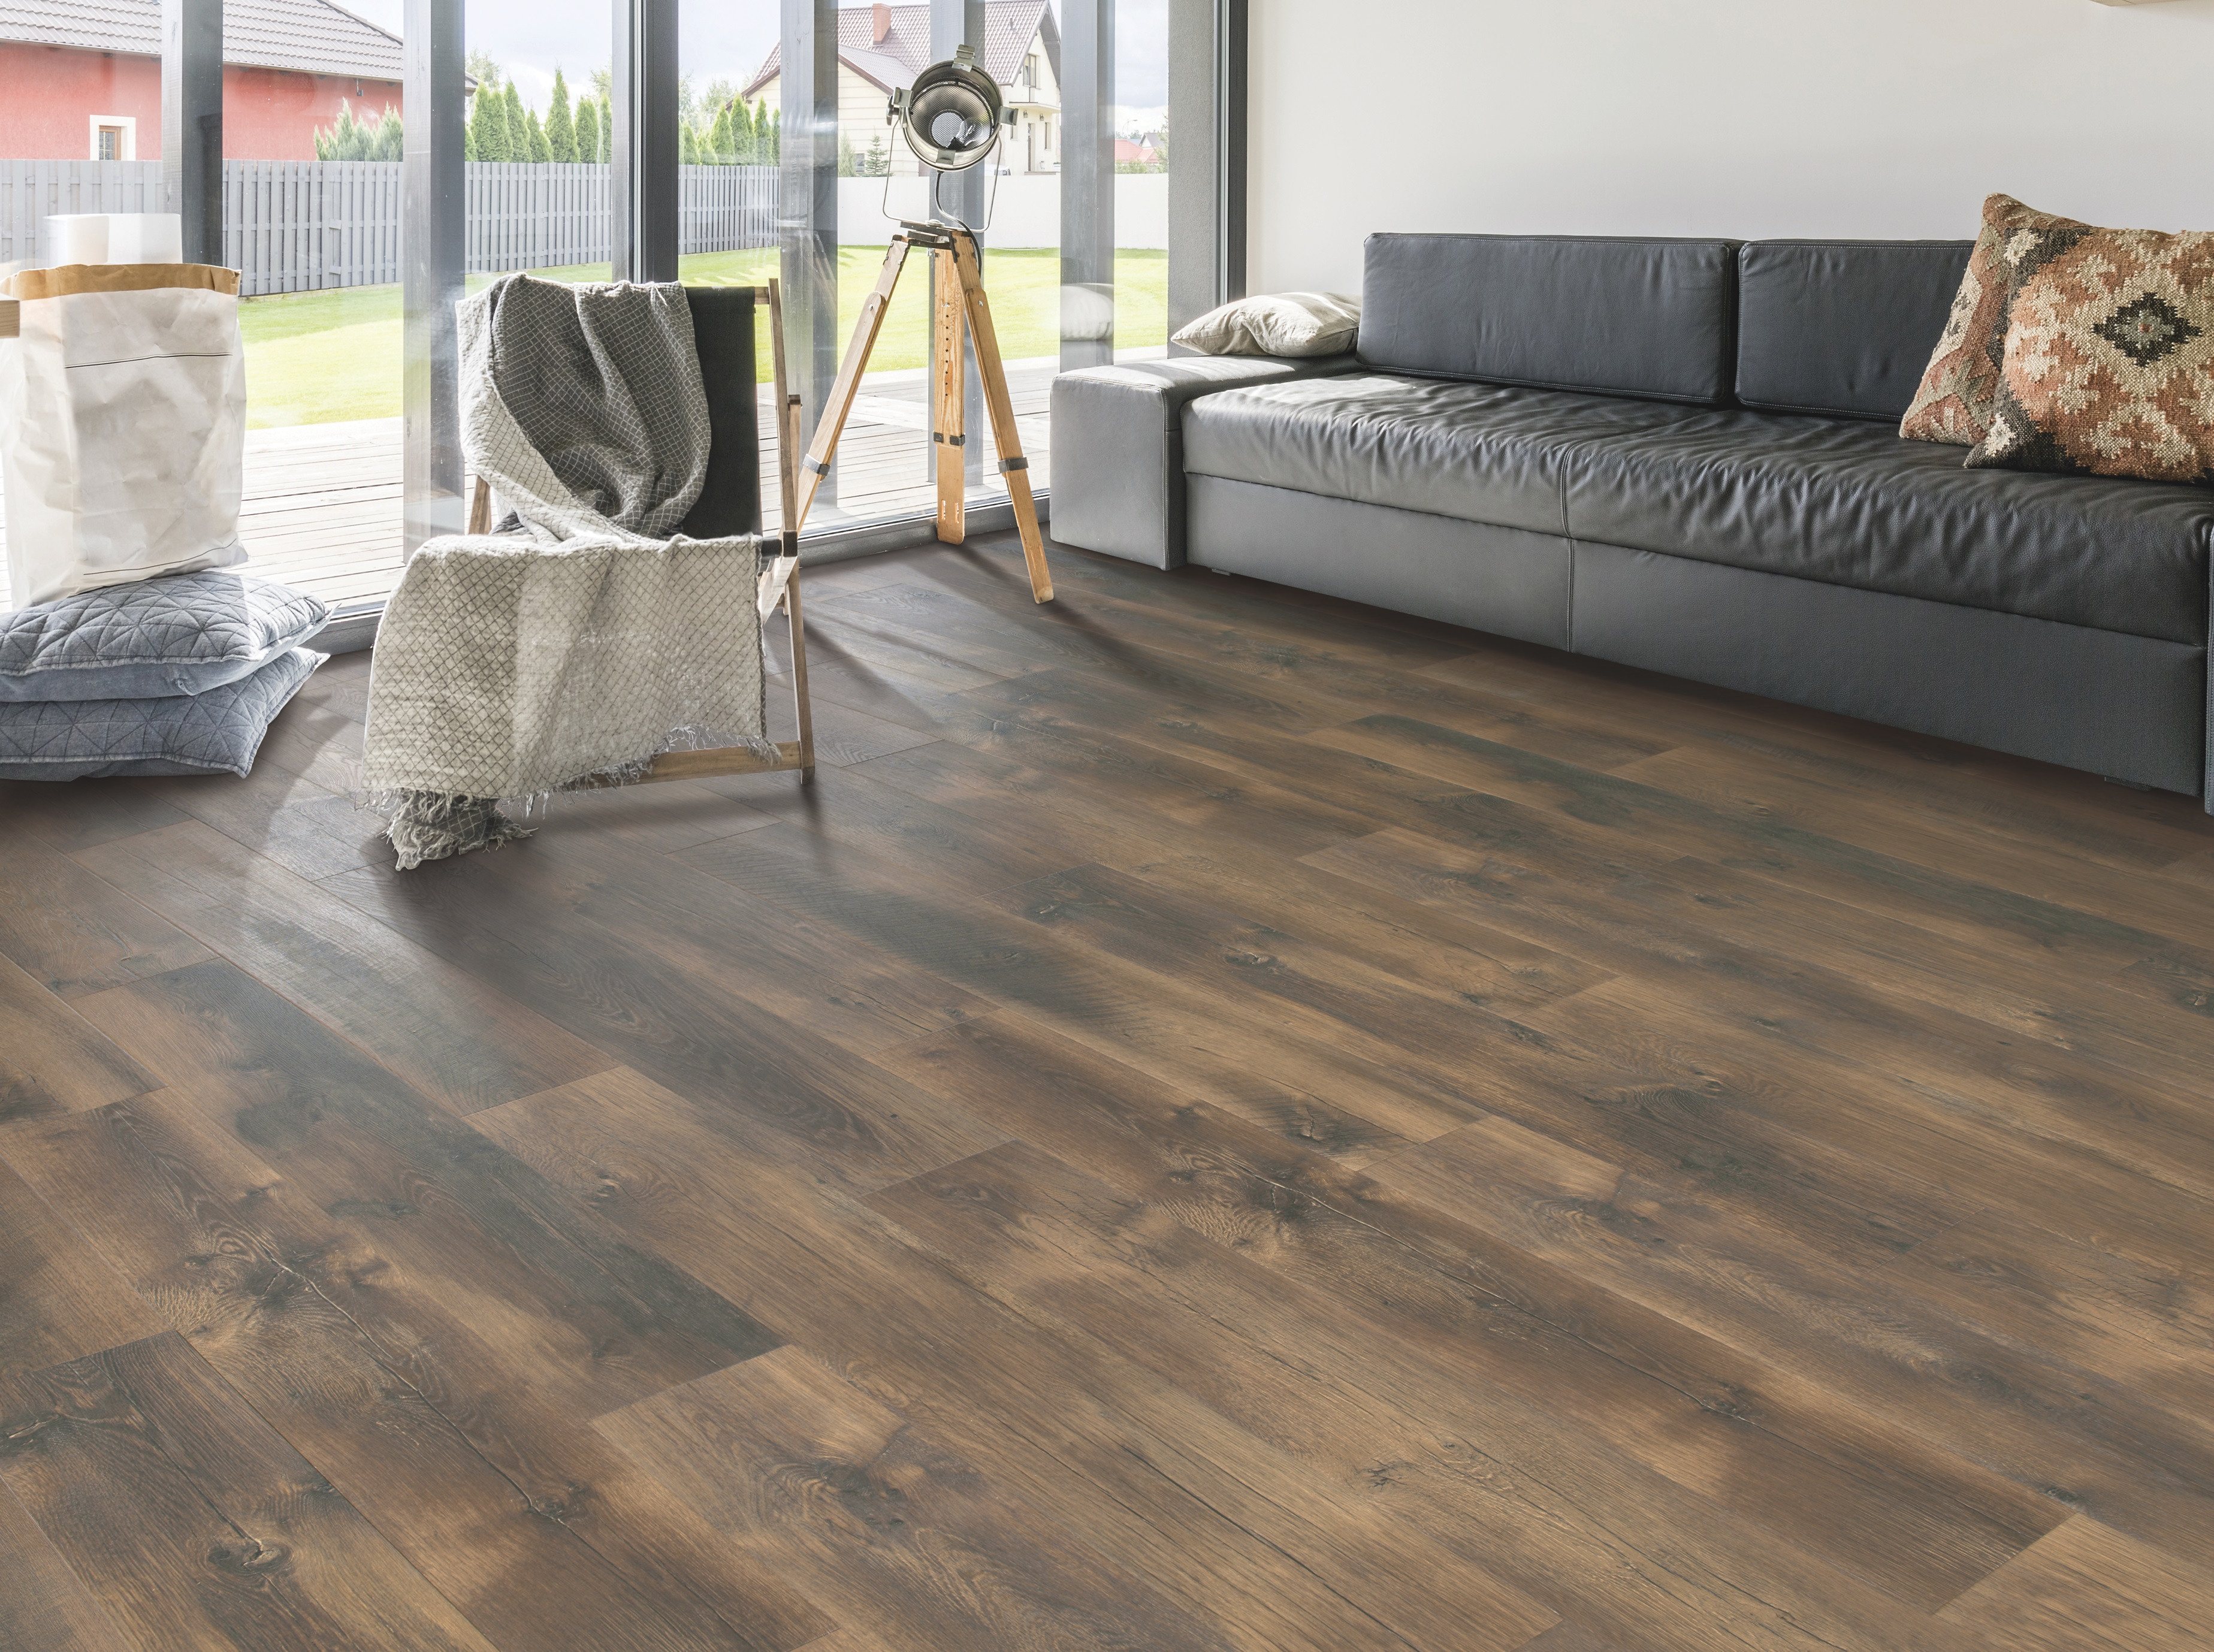 Wine Barrel Oak From Znet Flooring, Wine Barrel Laminate Flooring